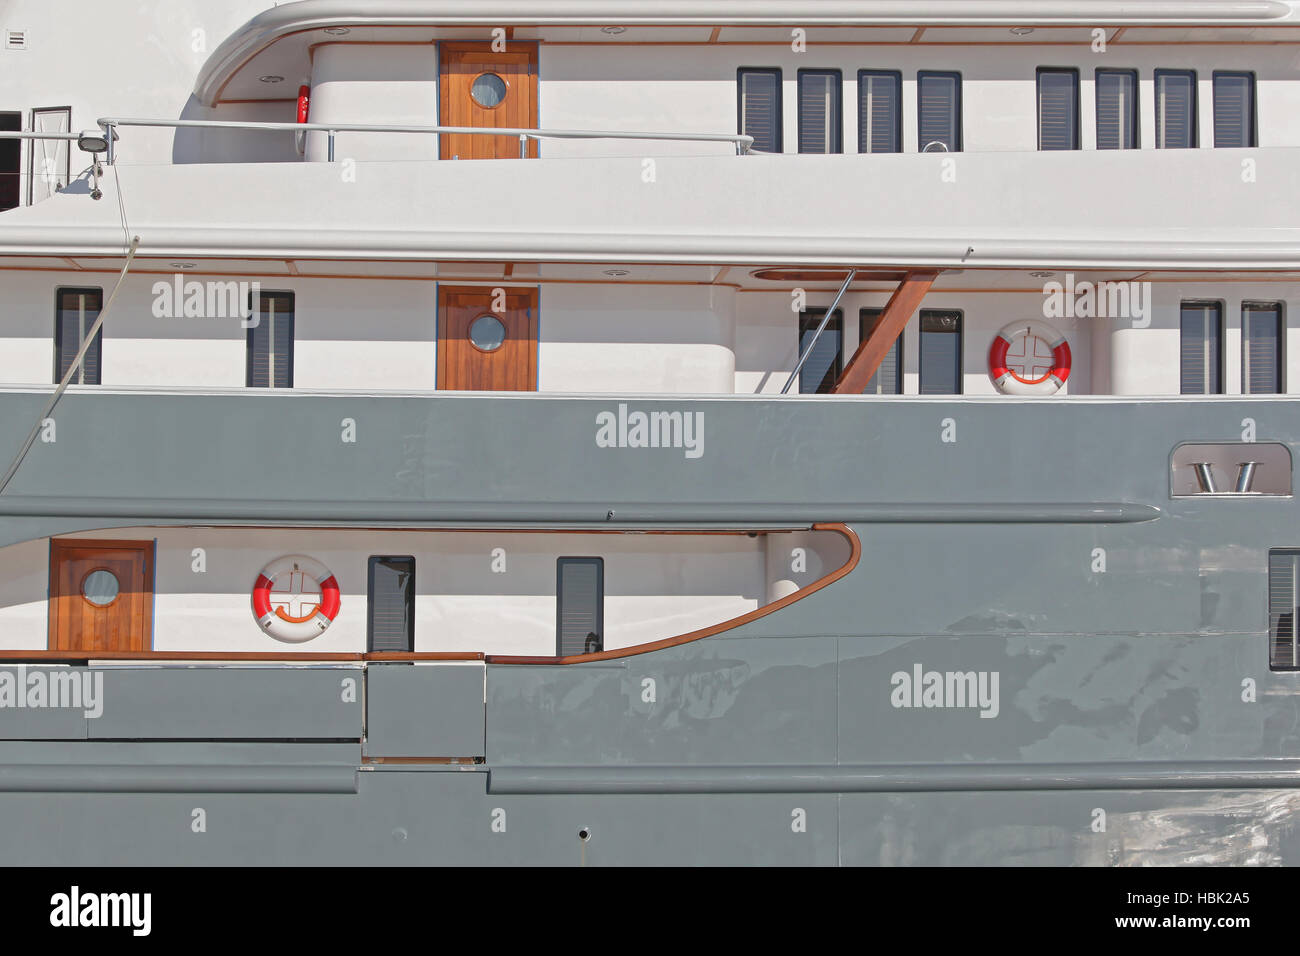 Ship Side - Stock Image